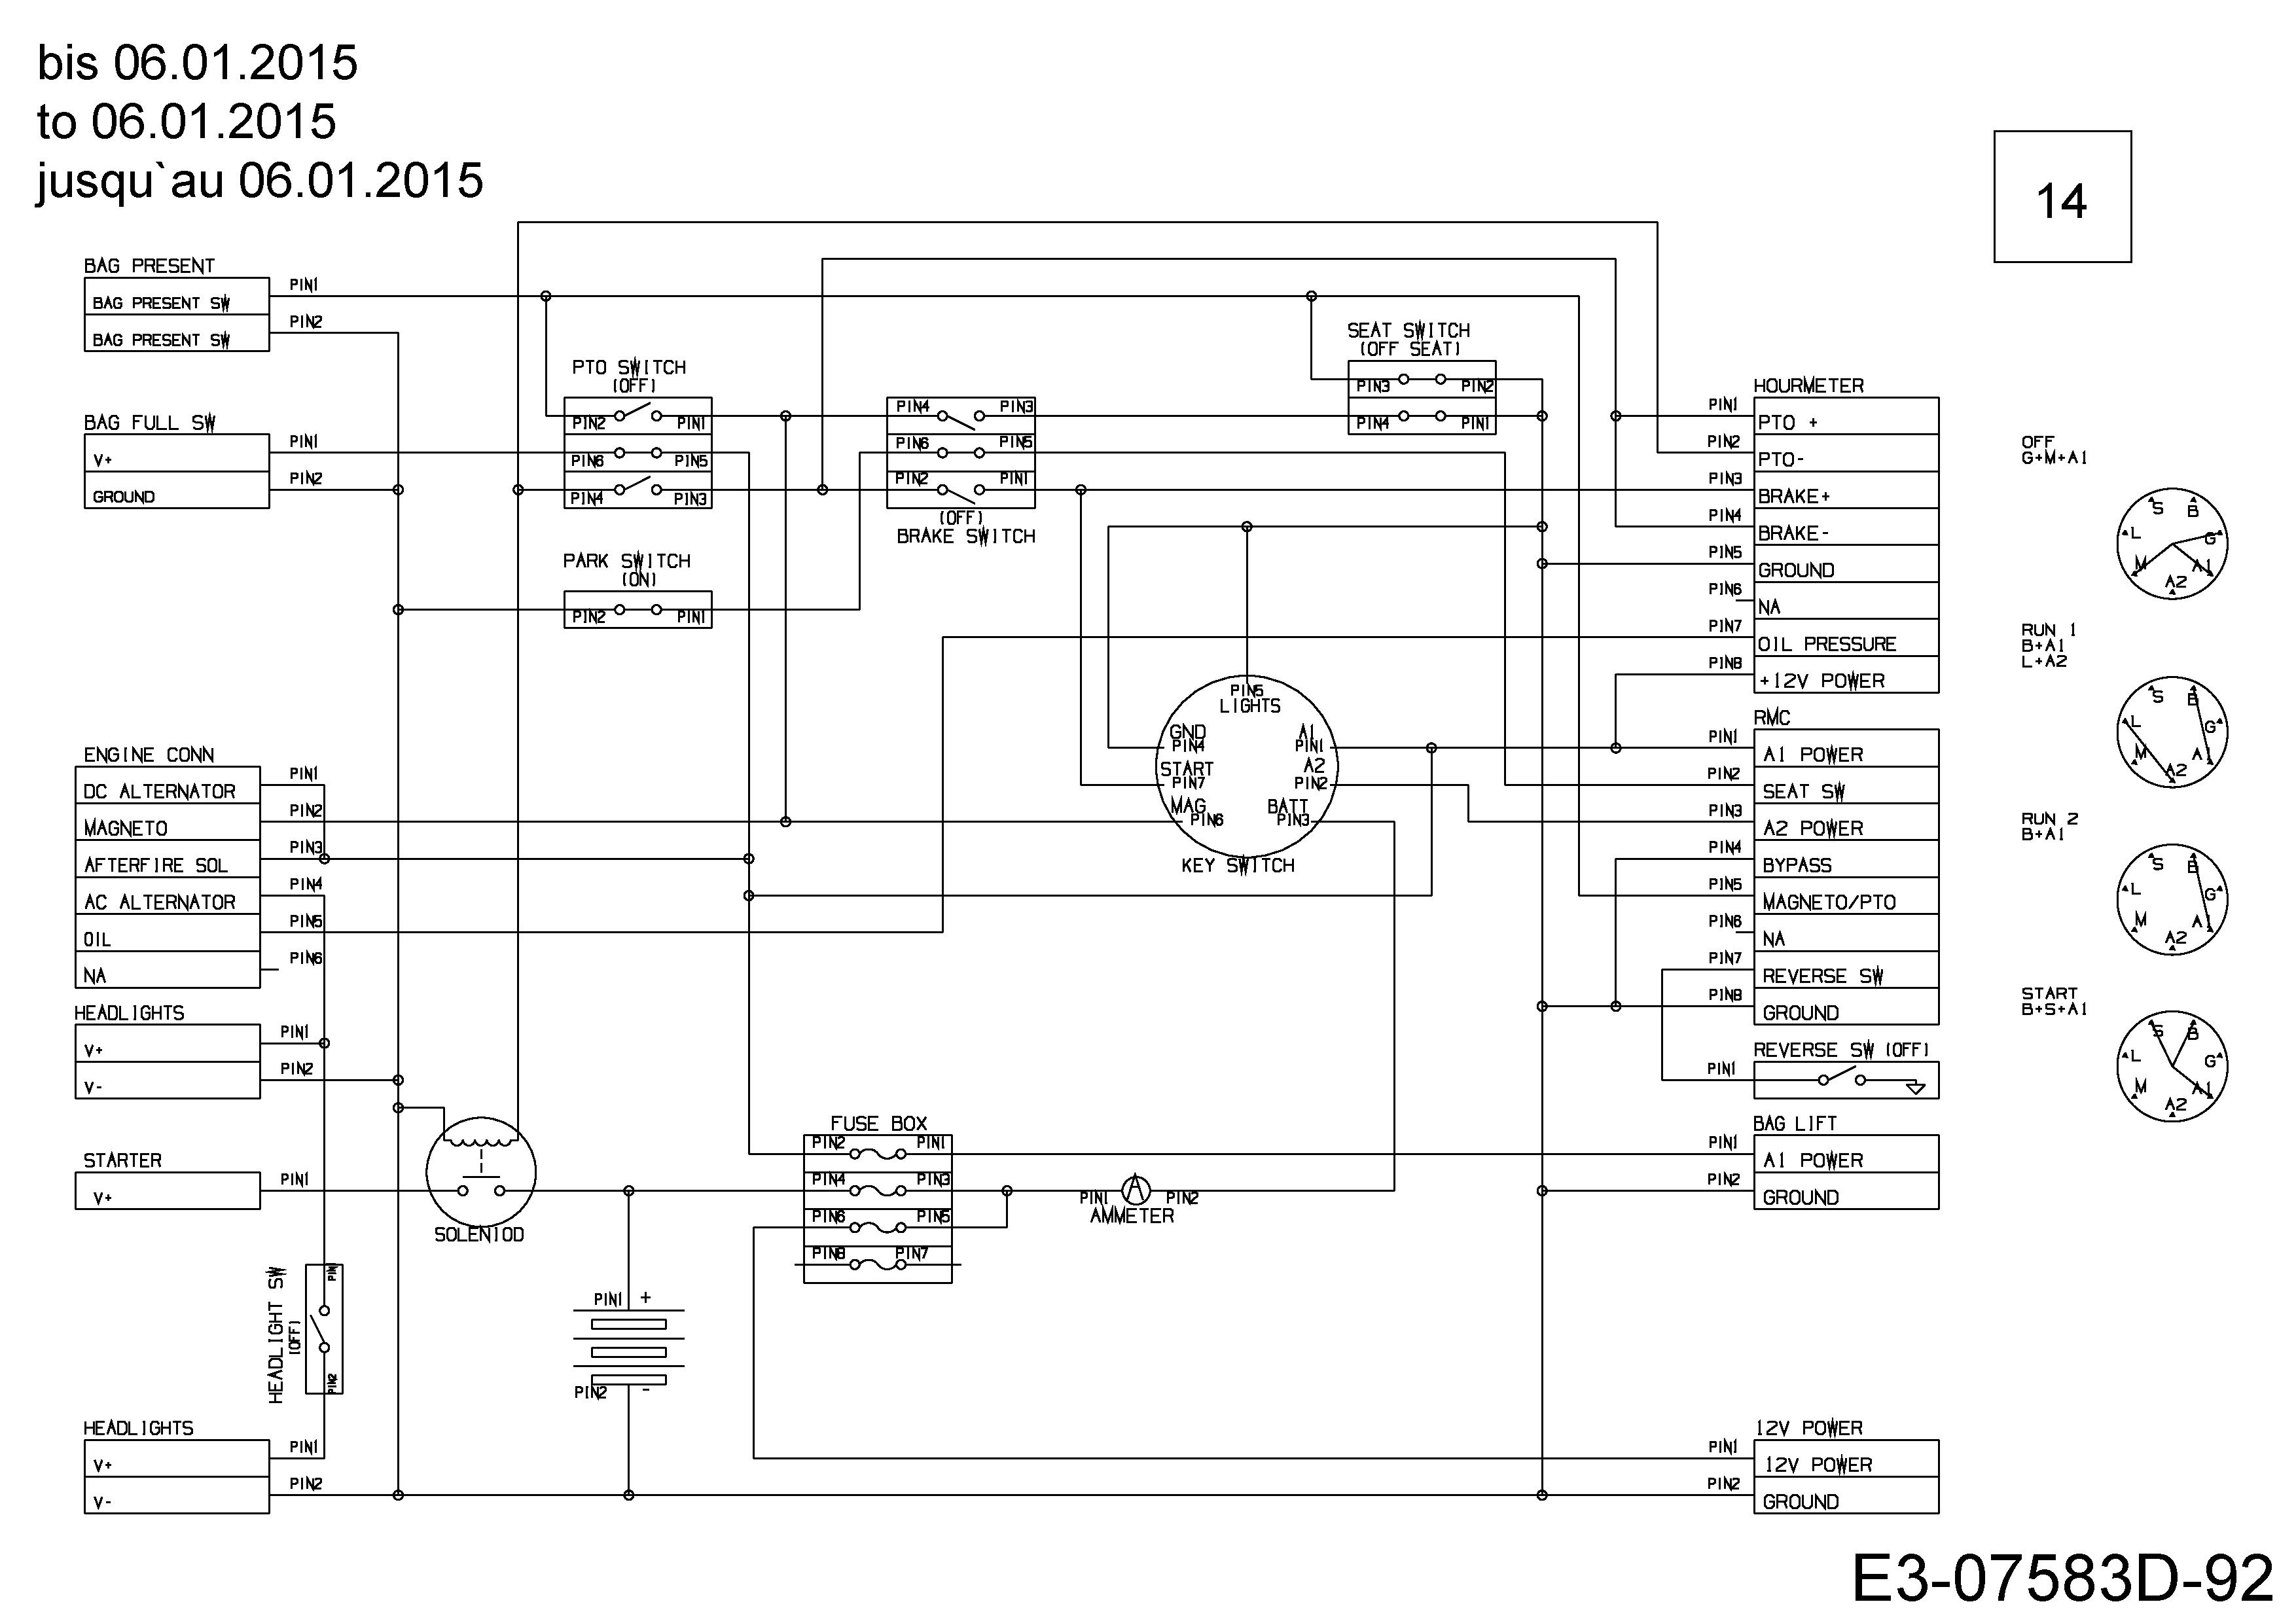 Schön Cub Cadet Schaltplan Ideen - Elektrische Schaltplan-Ideen ...